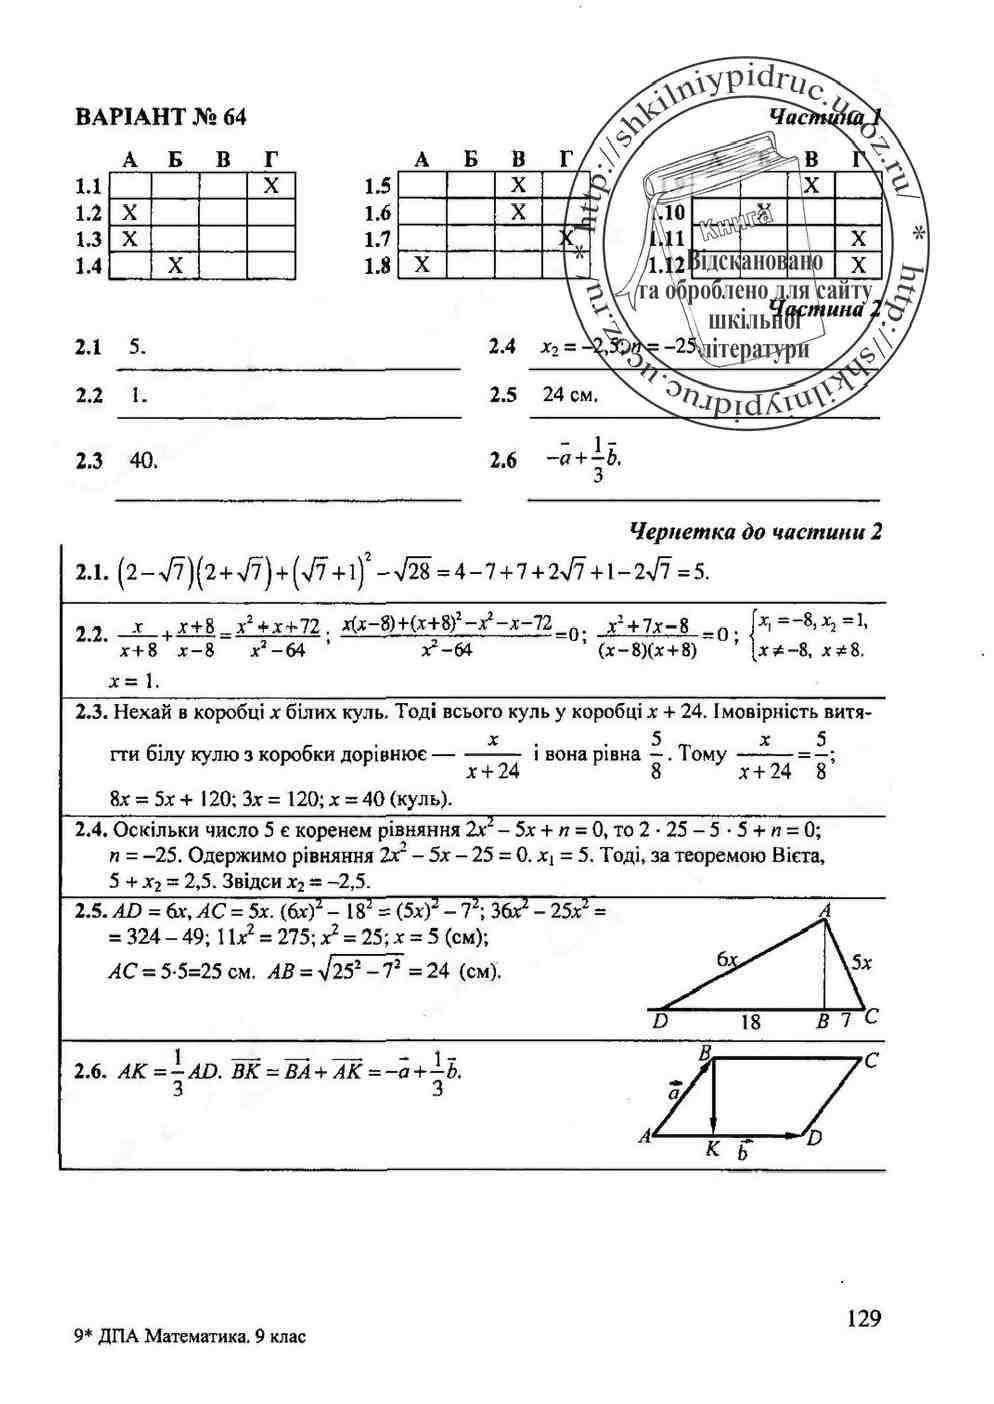 дпа 9 решебник математика